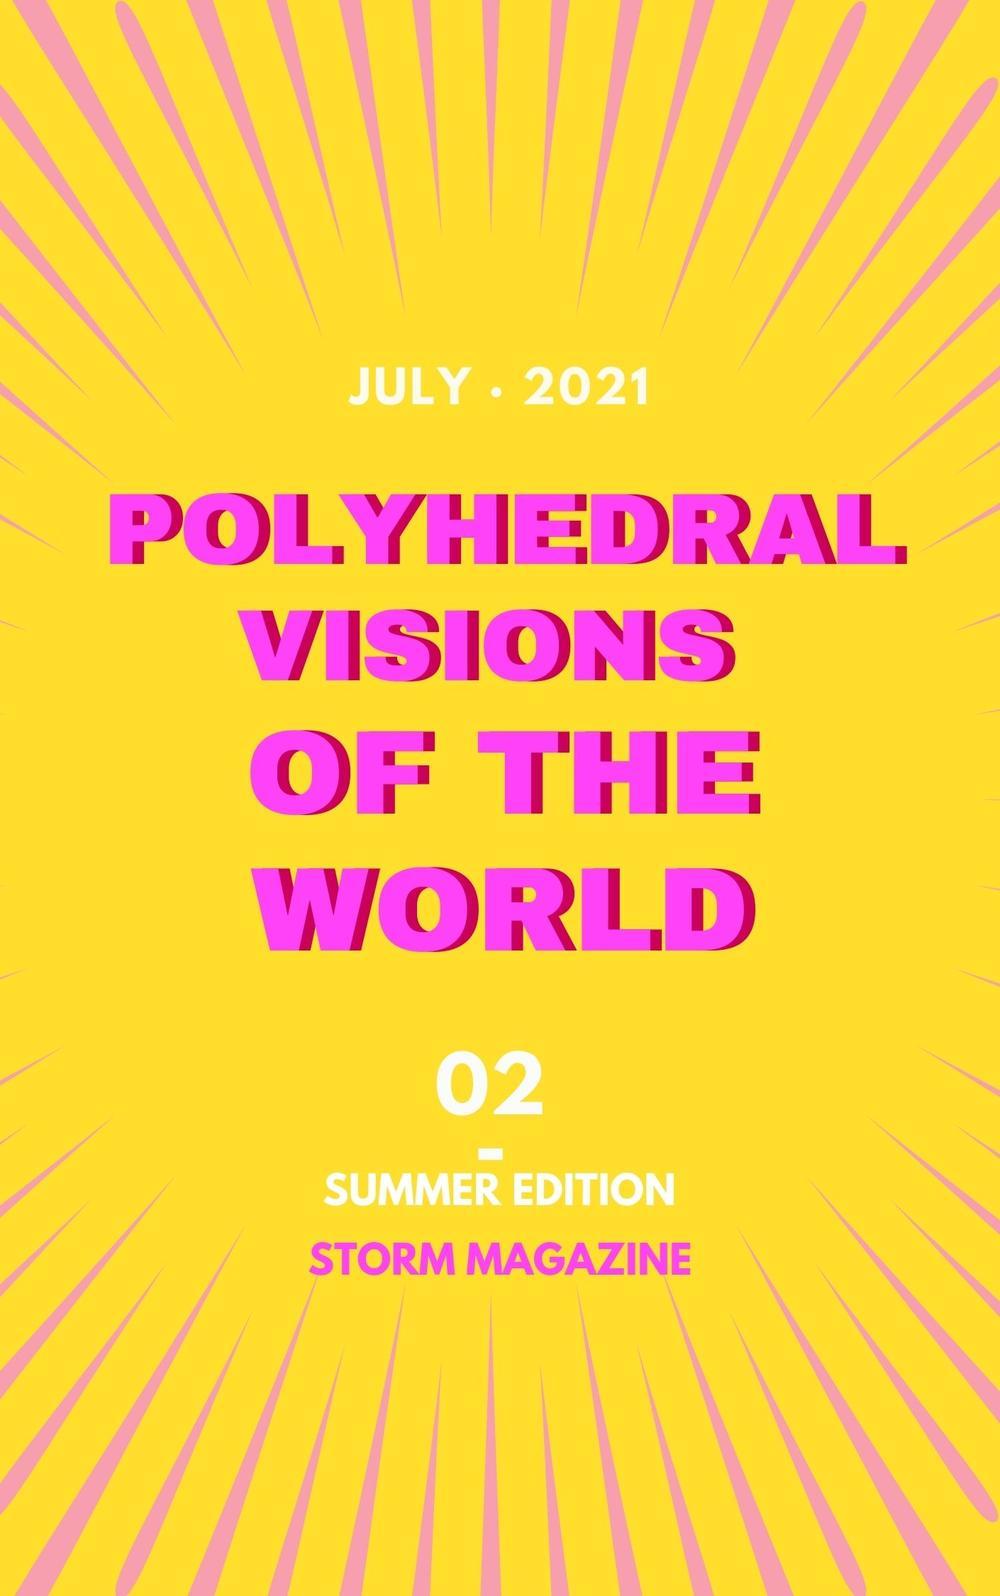 02_summer_edition_Storm_Magazine.jpg